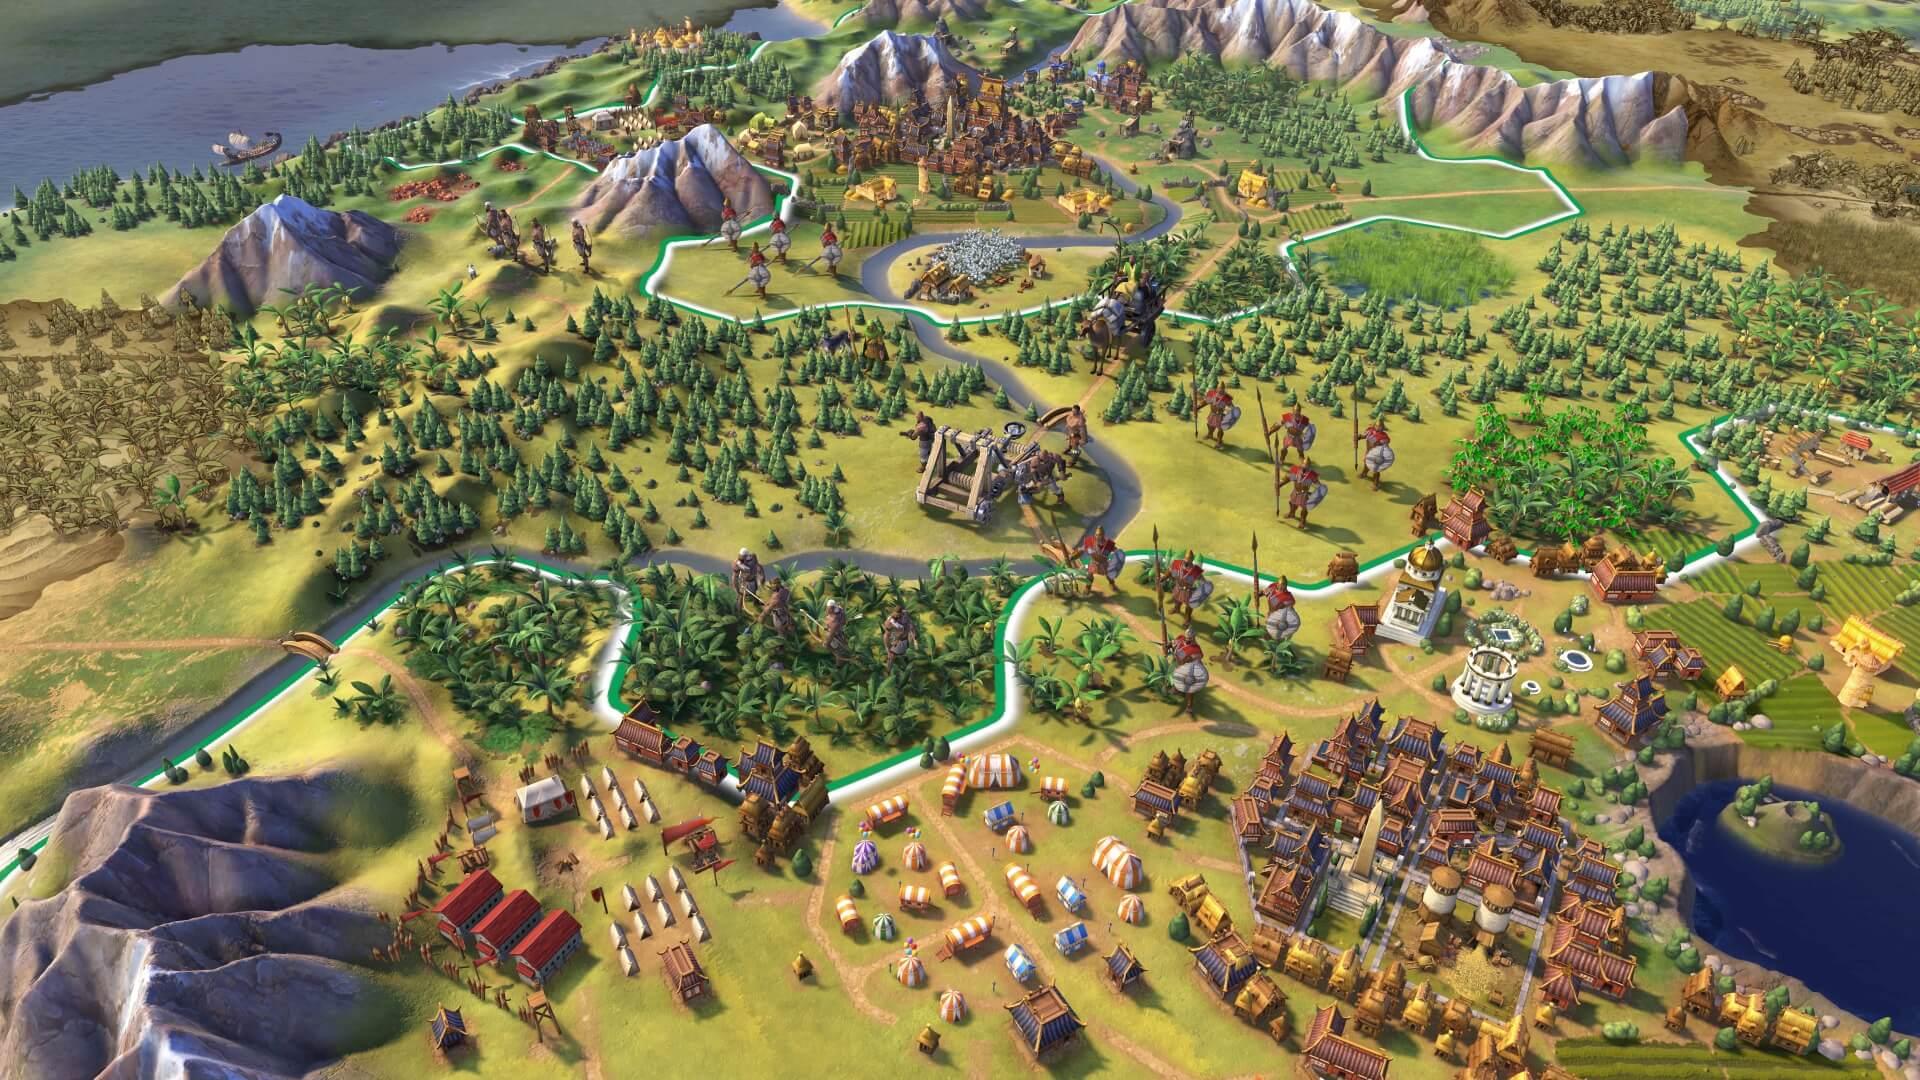 Epic Games Store Civilization VI oyununu ücretsiz olarak sundu